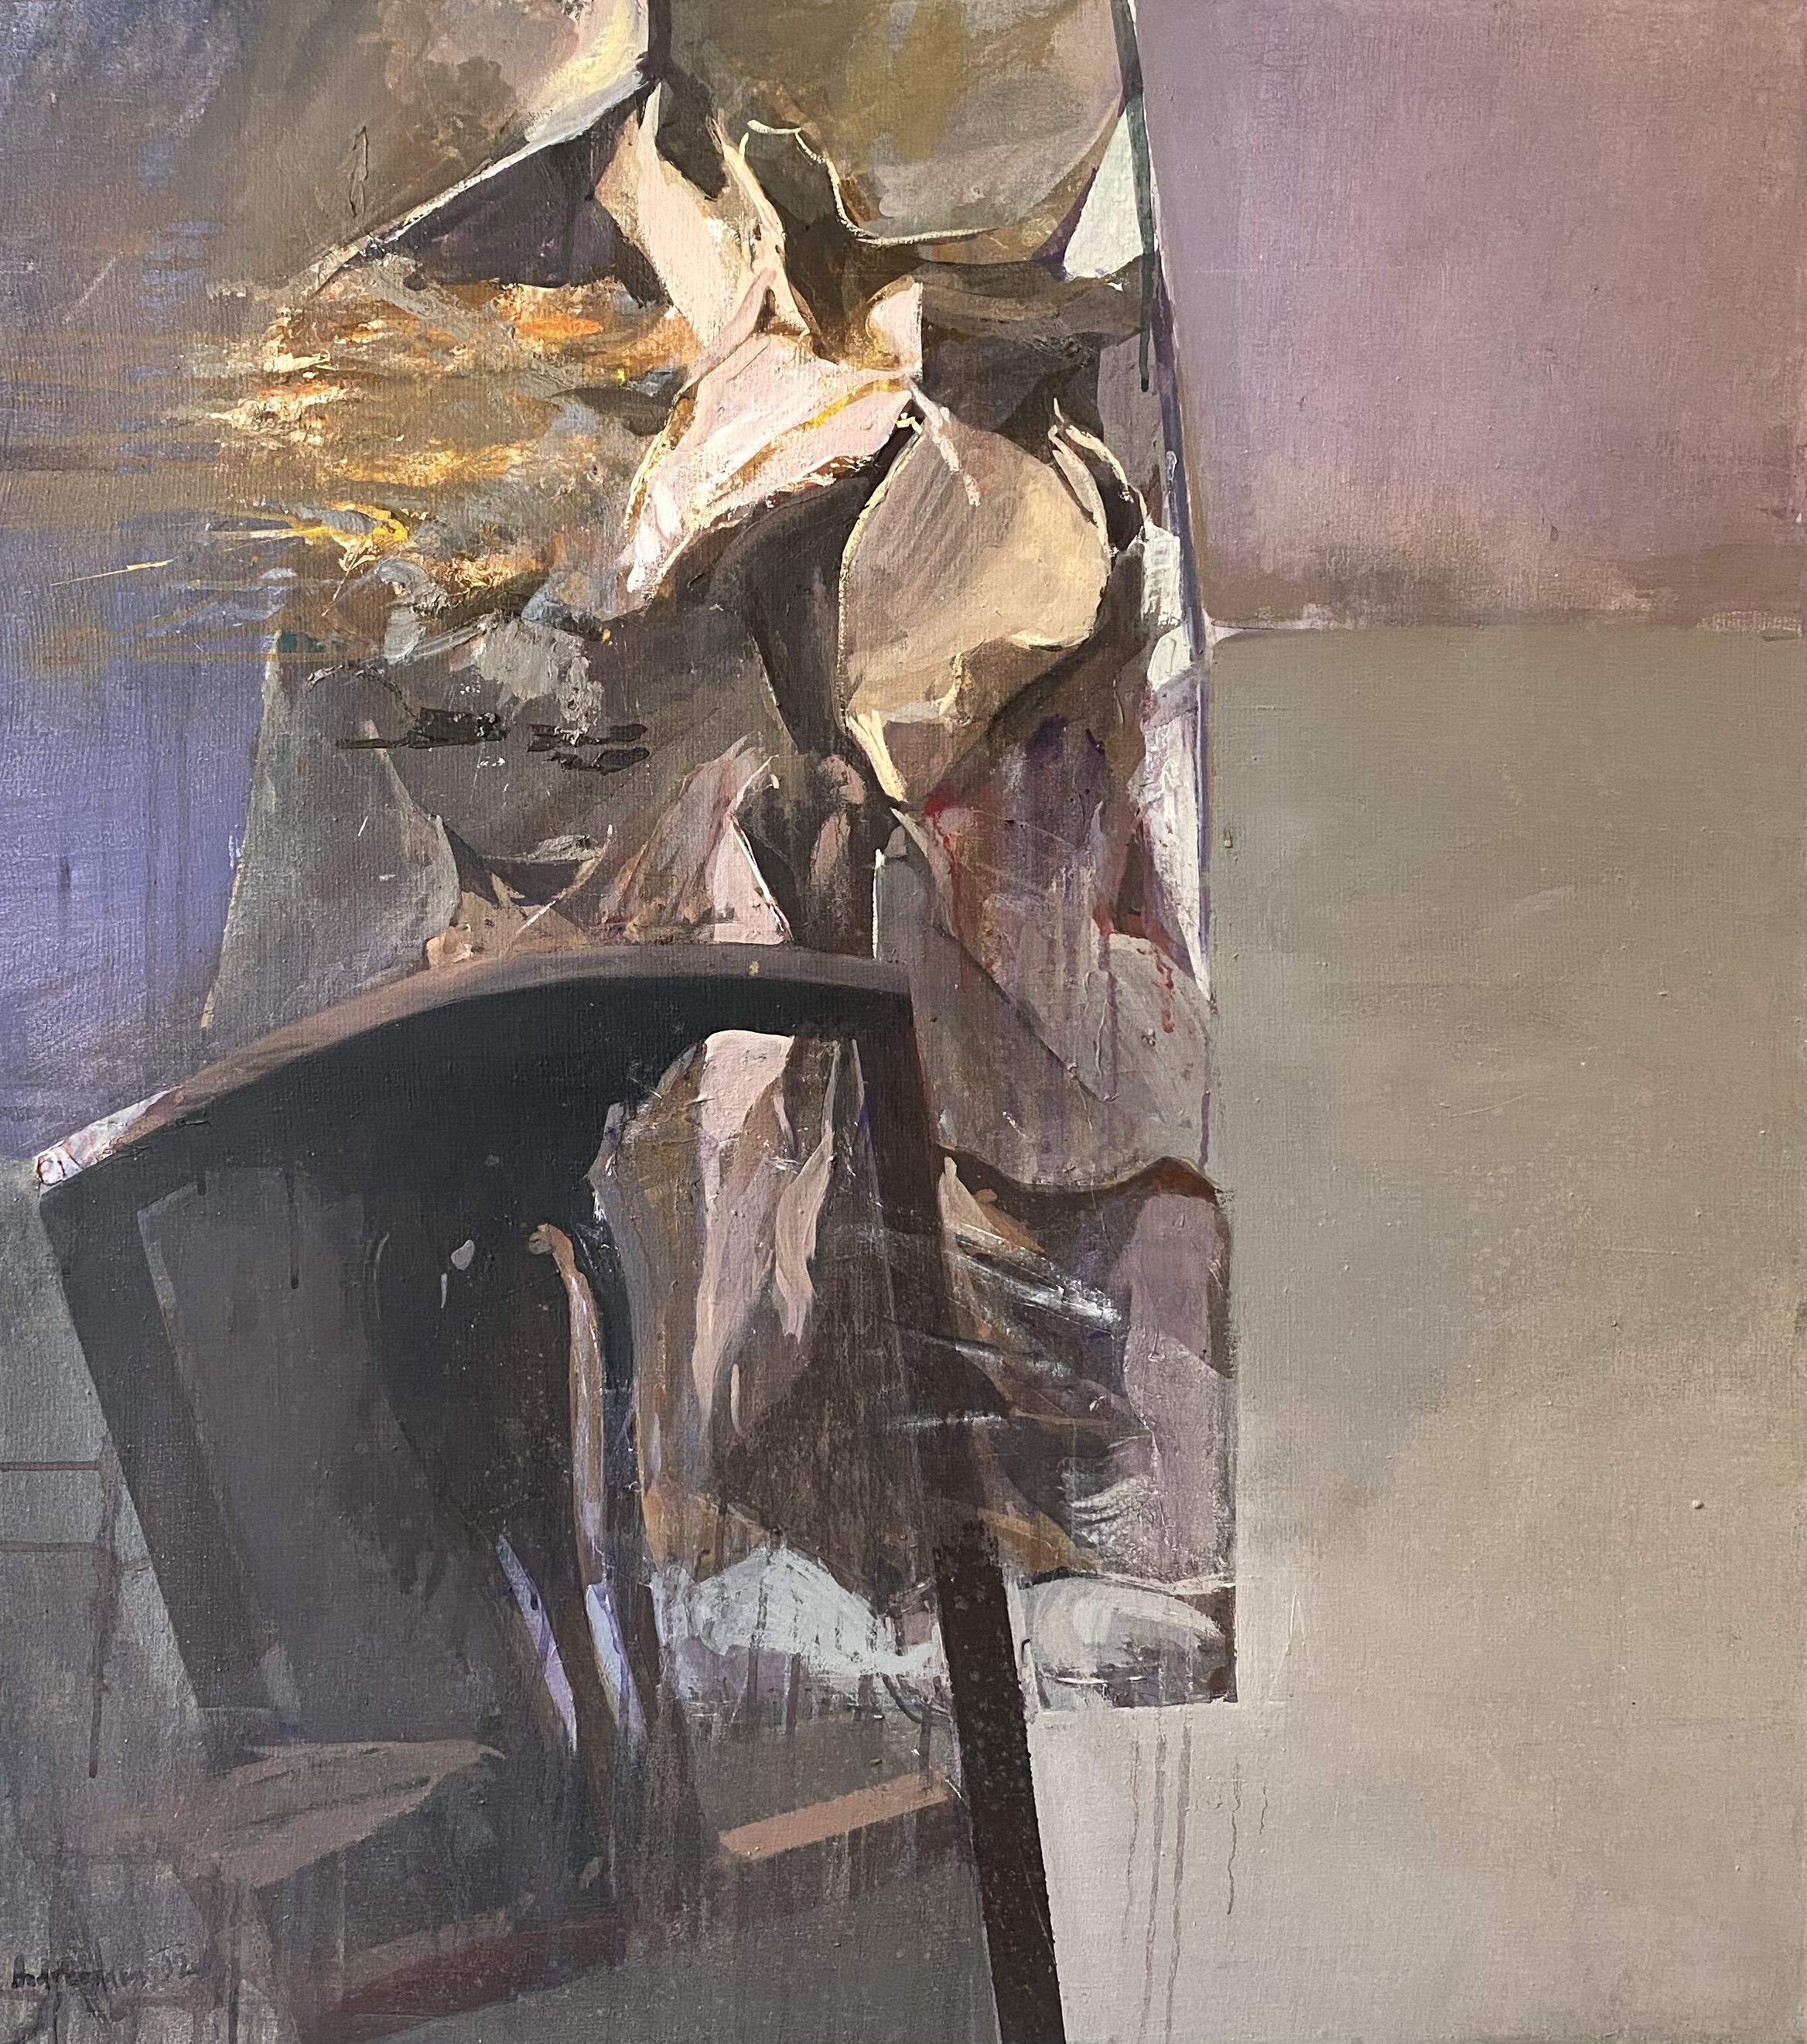 Dimitris Andreadakis (Greek, born 1964) (AR), untitled, 1992, oil on canvas, 92 x 80 cm.